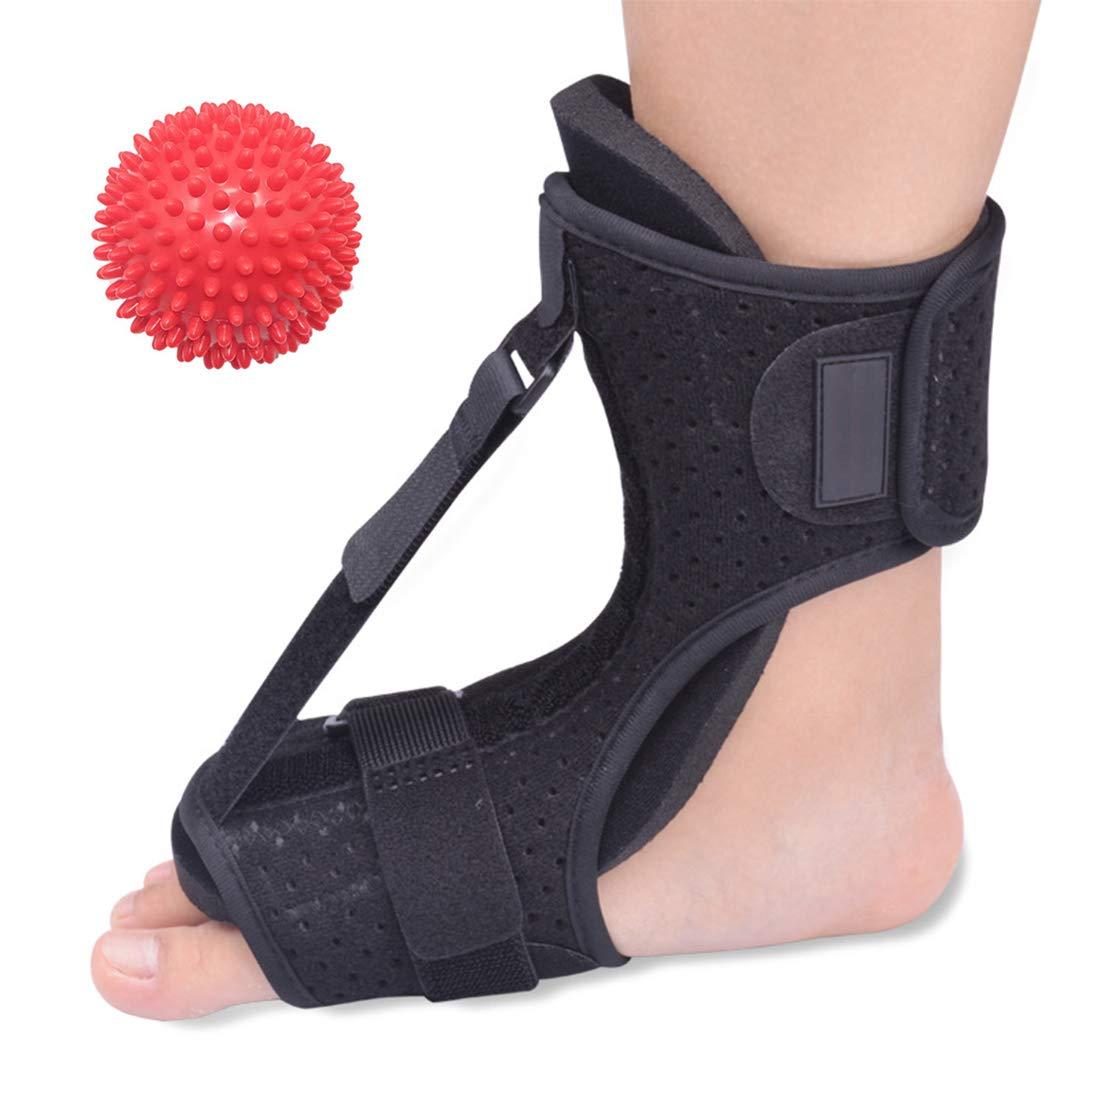 Plantar Fasciitis Night Splint Drop Foot Orthotic Brace Adjustable Dorsal Night Splints for Flat Feet, Heel, Ankle, Arch Foot Pain, Achilles Tendonitis Brace for Women, Men with Foot Massage Balls